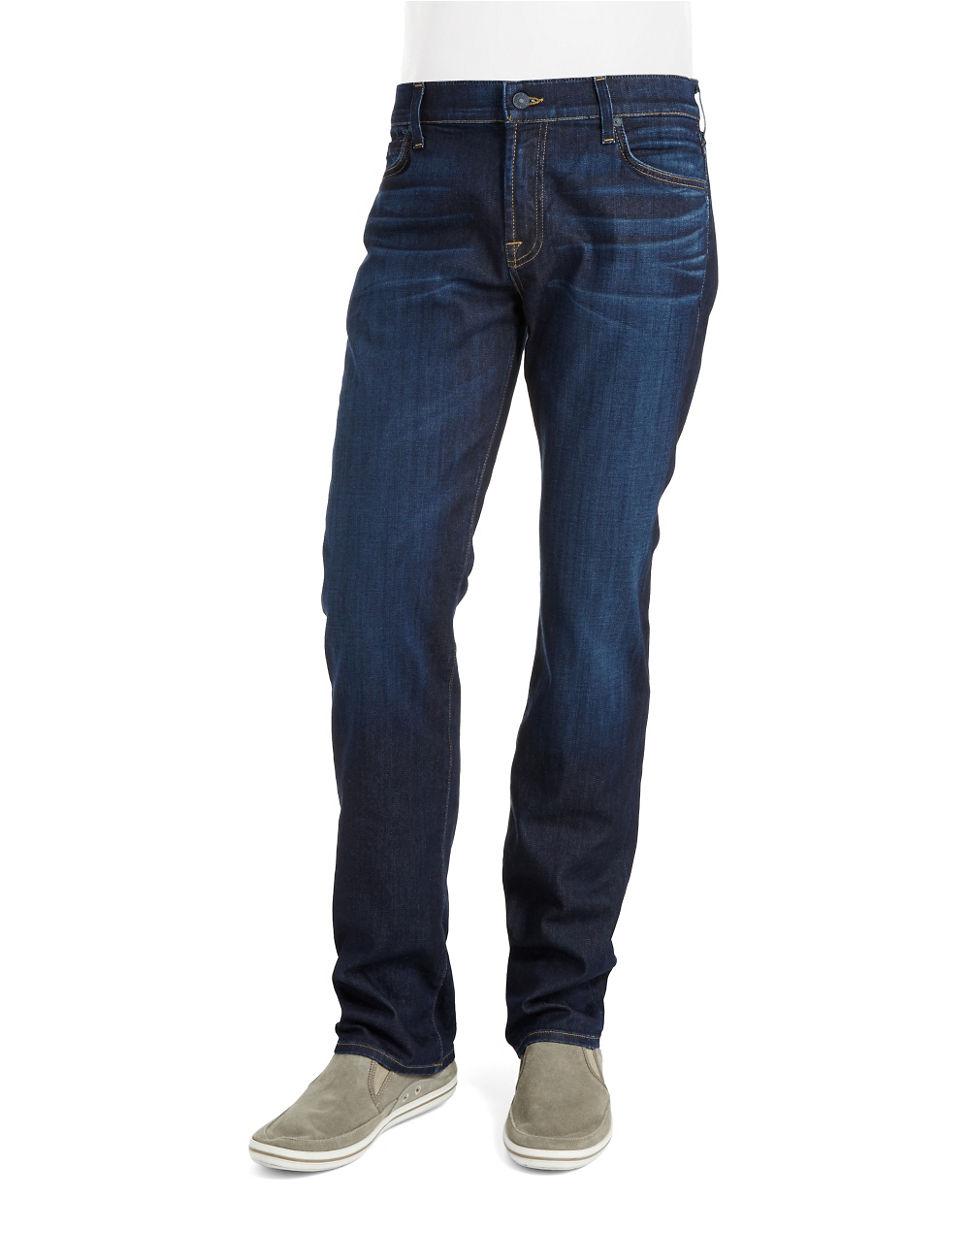 lyst 7 for all mankind straight leg jeans in blue for men. Black Bedroom Furniture Sets. Home Design Ideas